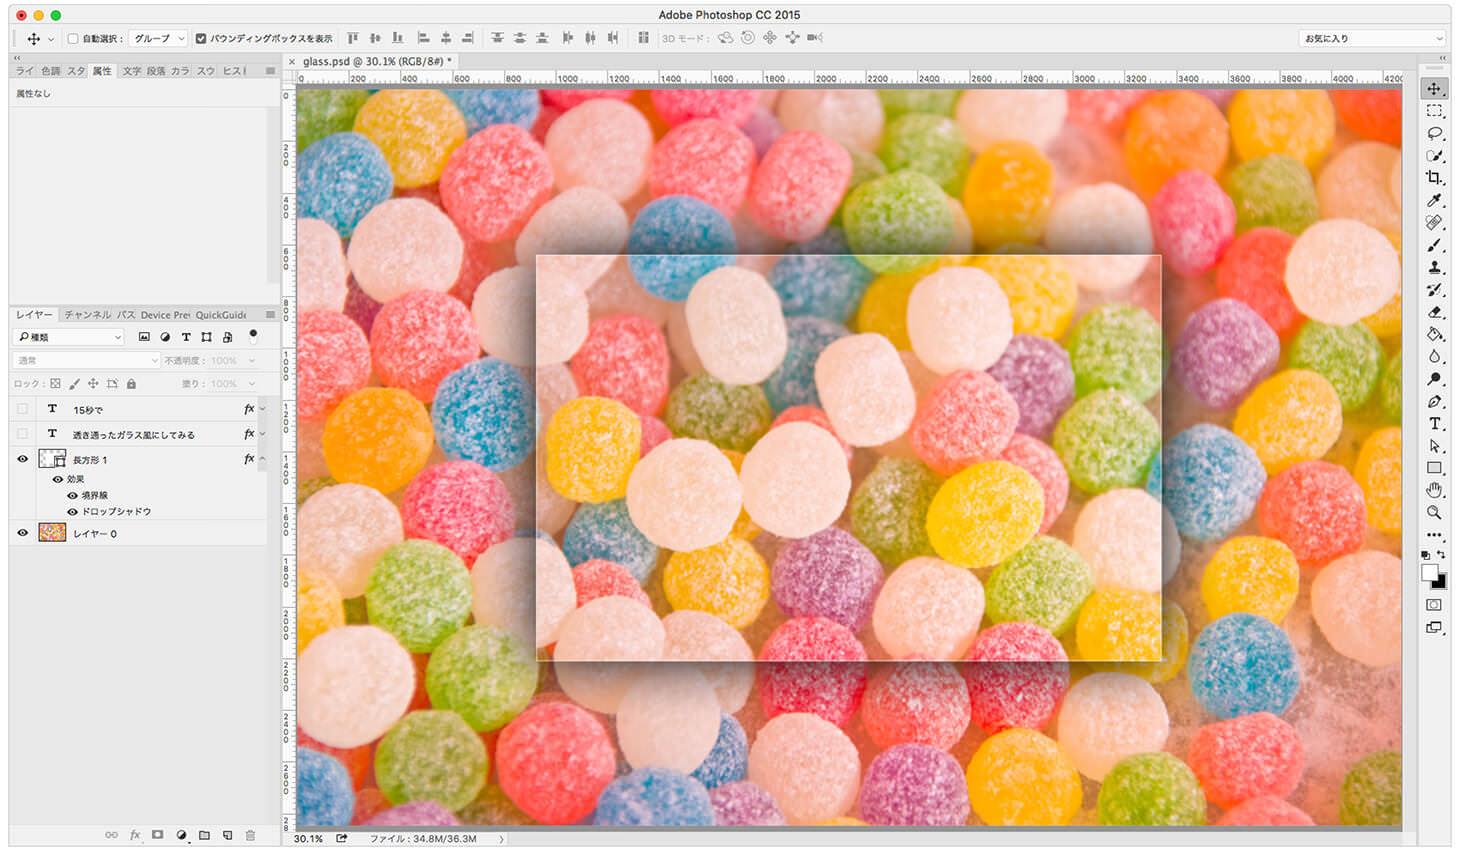 10_201603025-photoshop-pure-glass